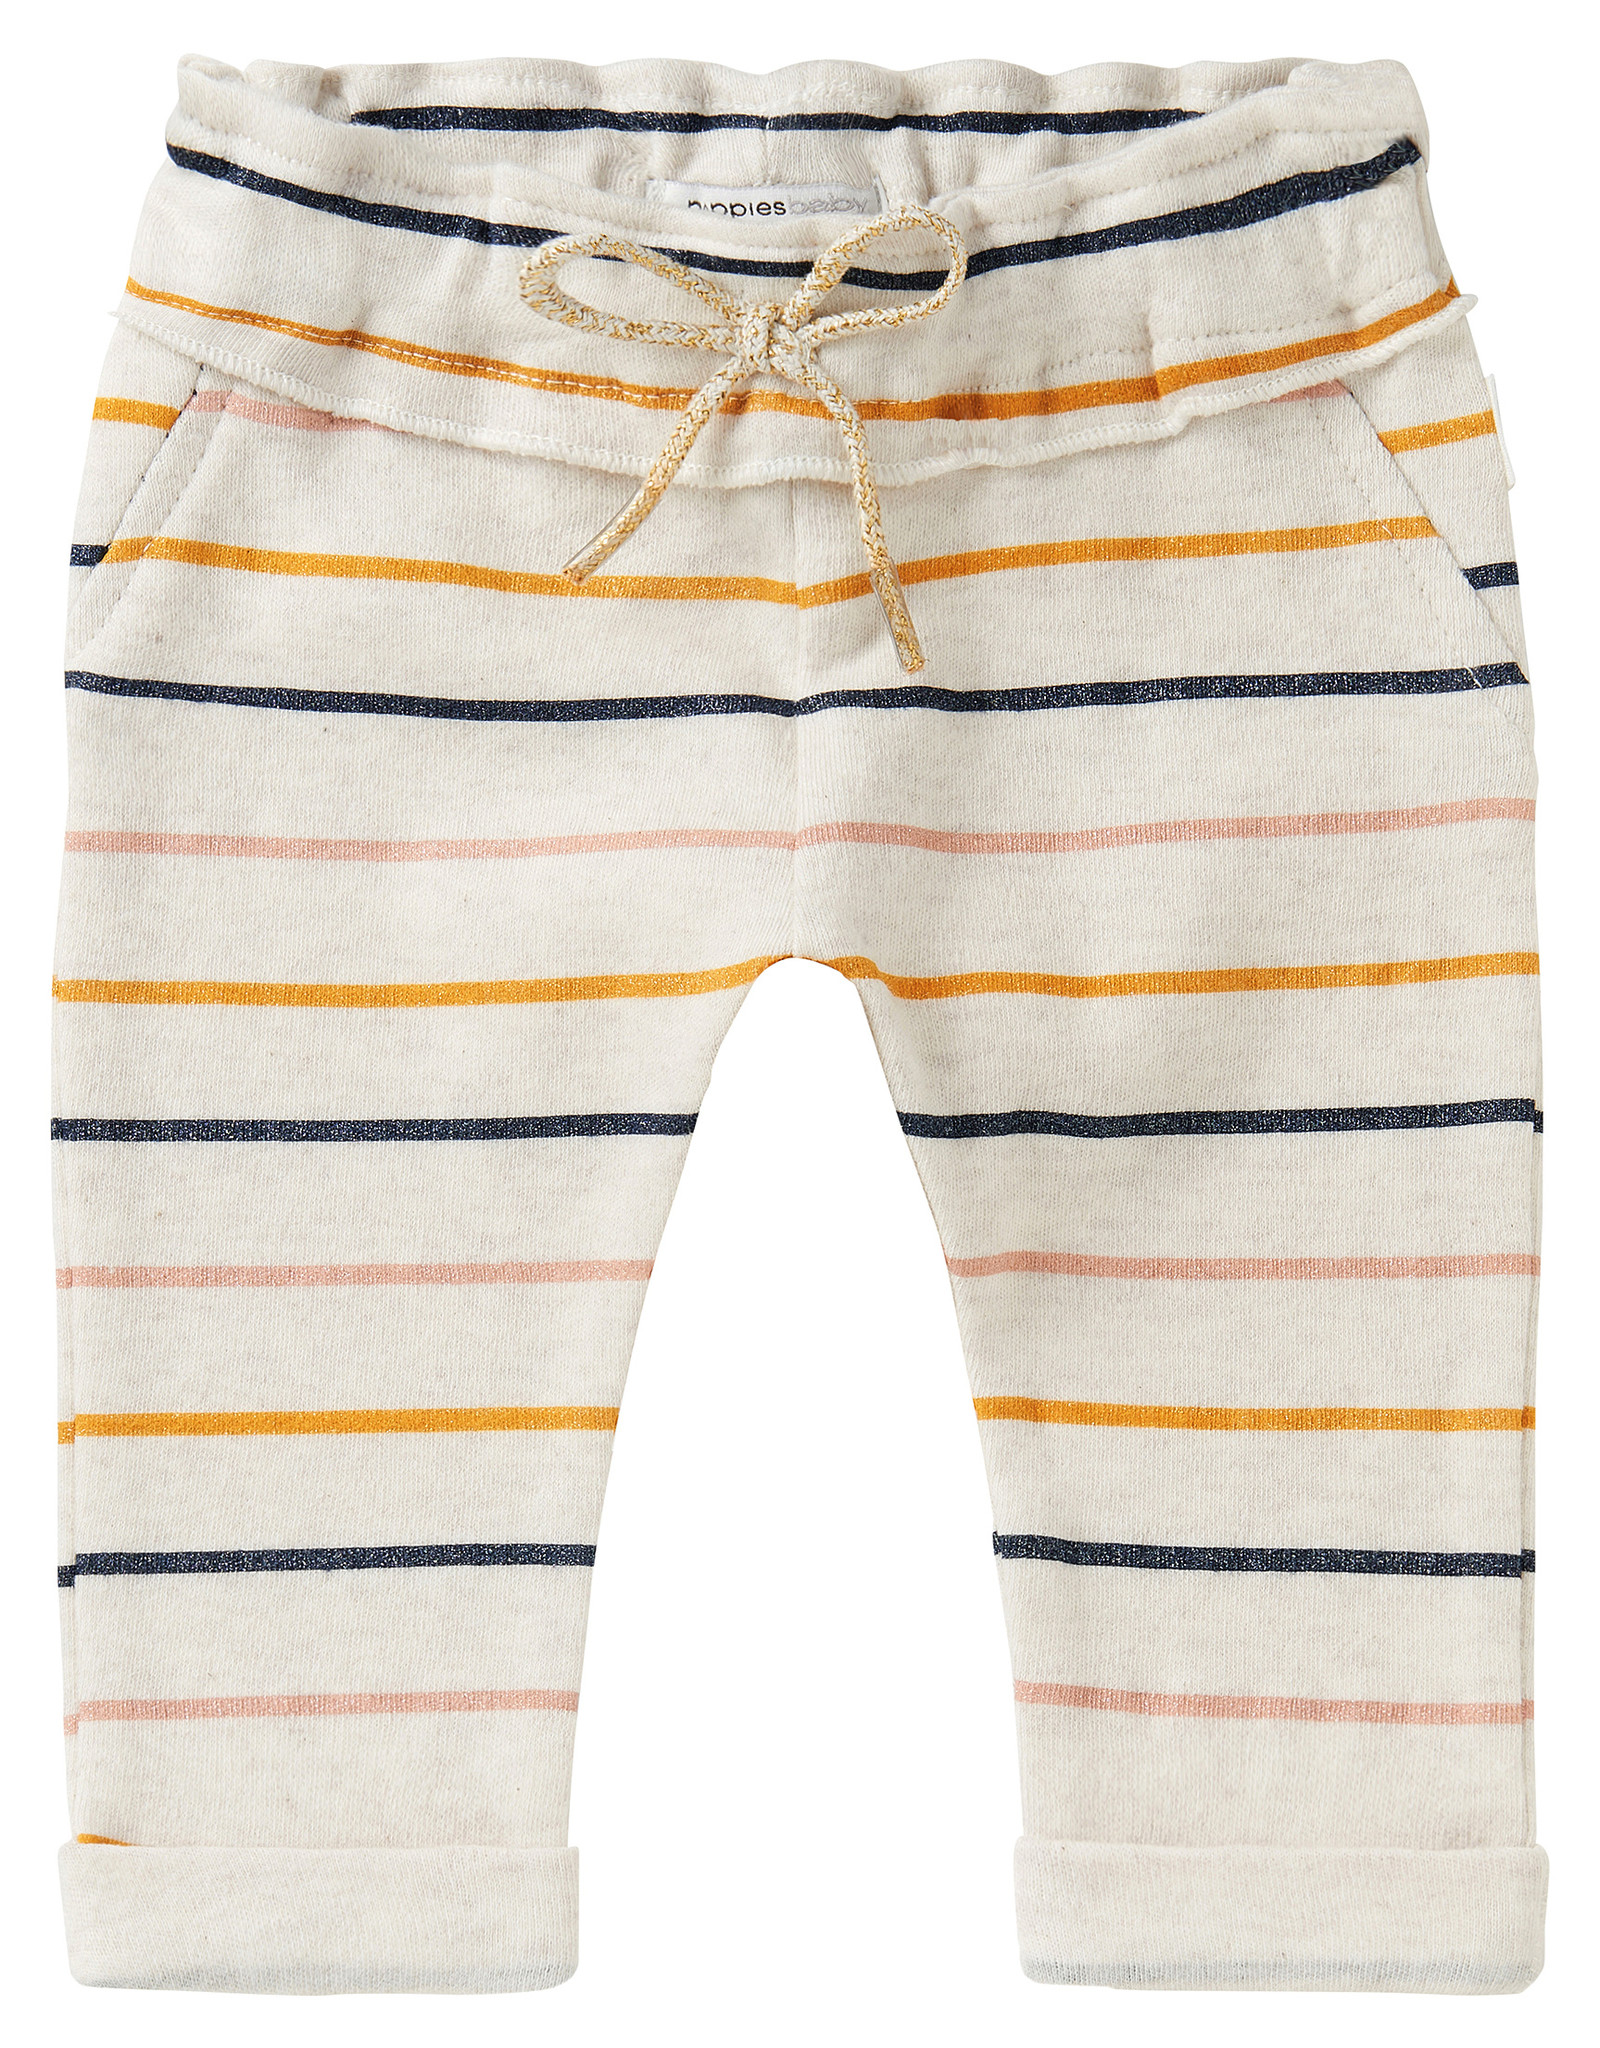 Noppies G Regular fit Pants Orania Str, Oatmeal